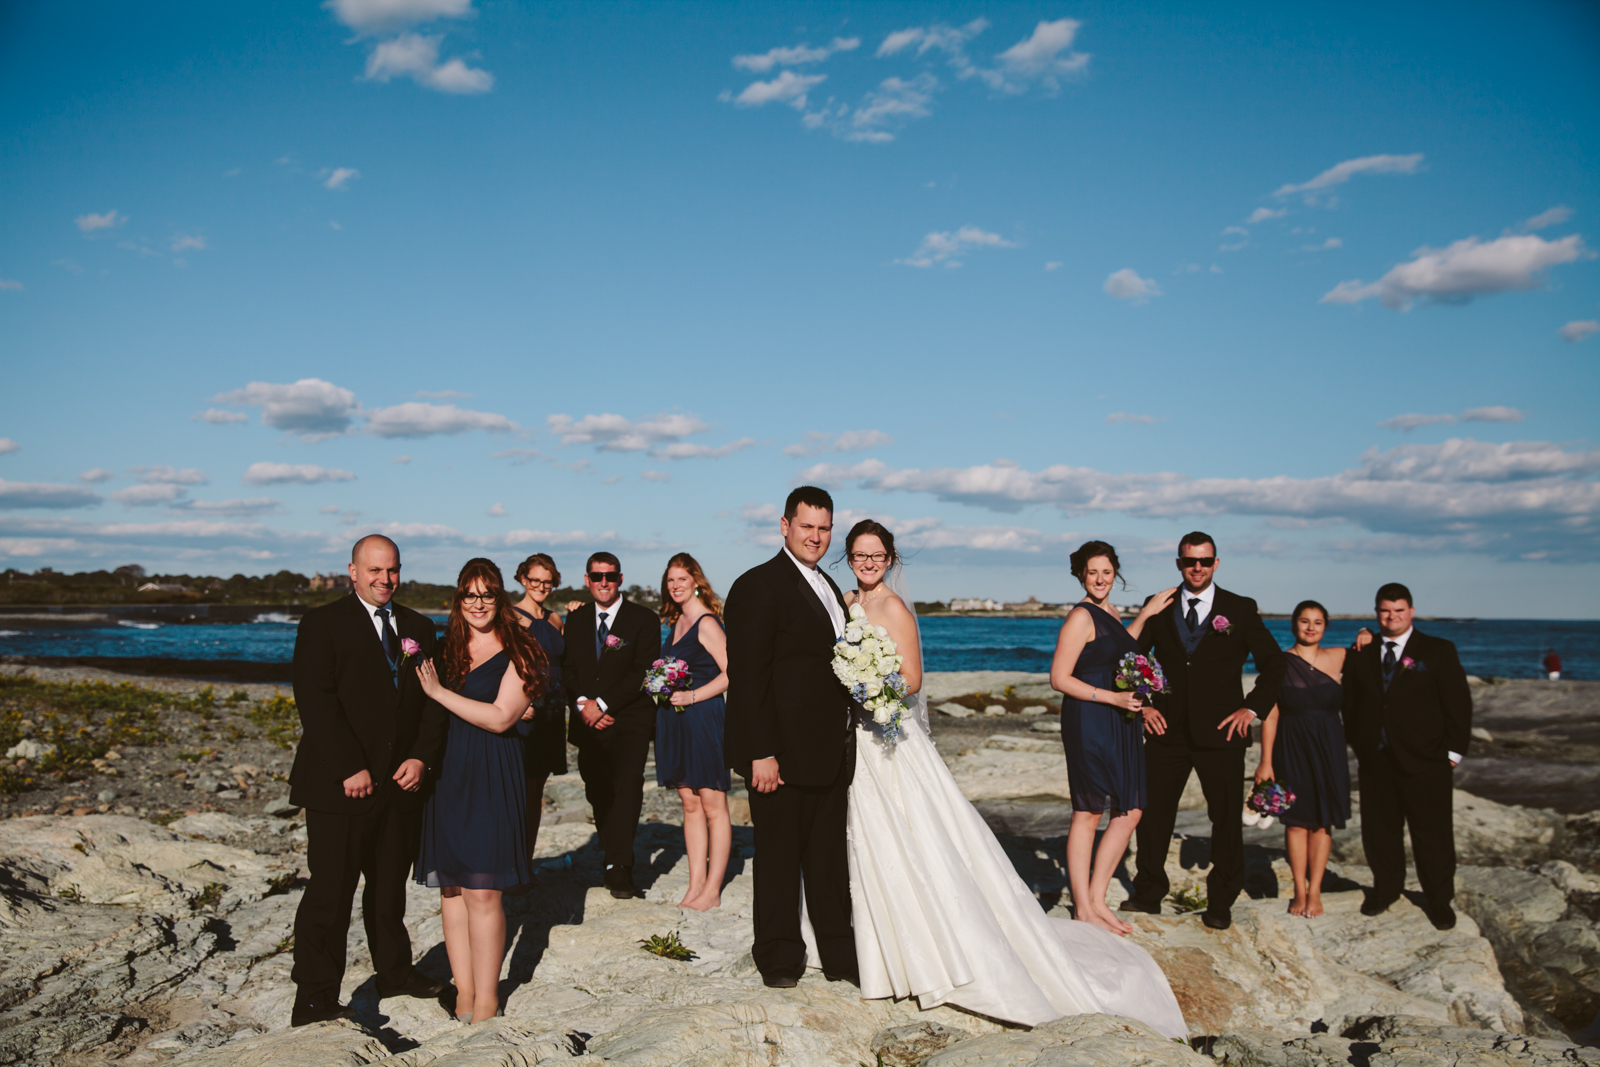 Eastons-Beach-Rotunda-Ballroom-Wedding-Newport-Rhode-Island-PhotographybyAmandaMorgan-66.jpg